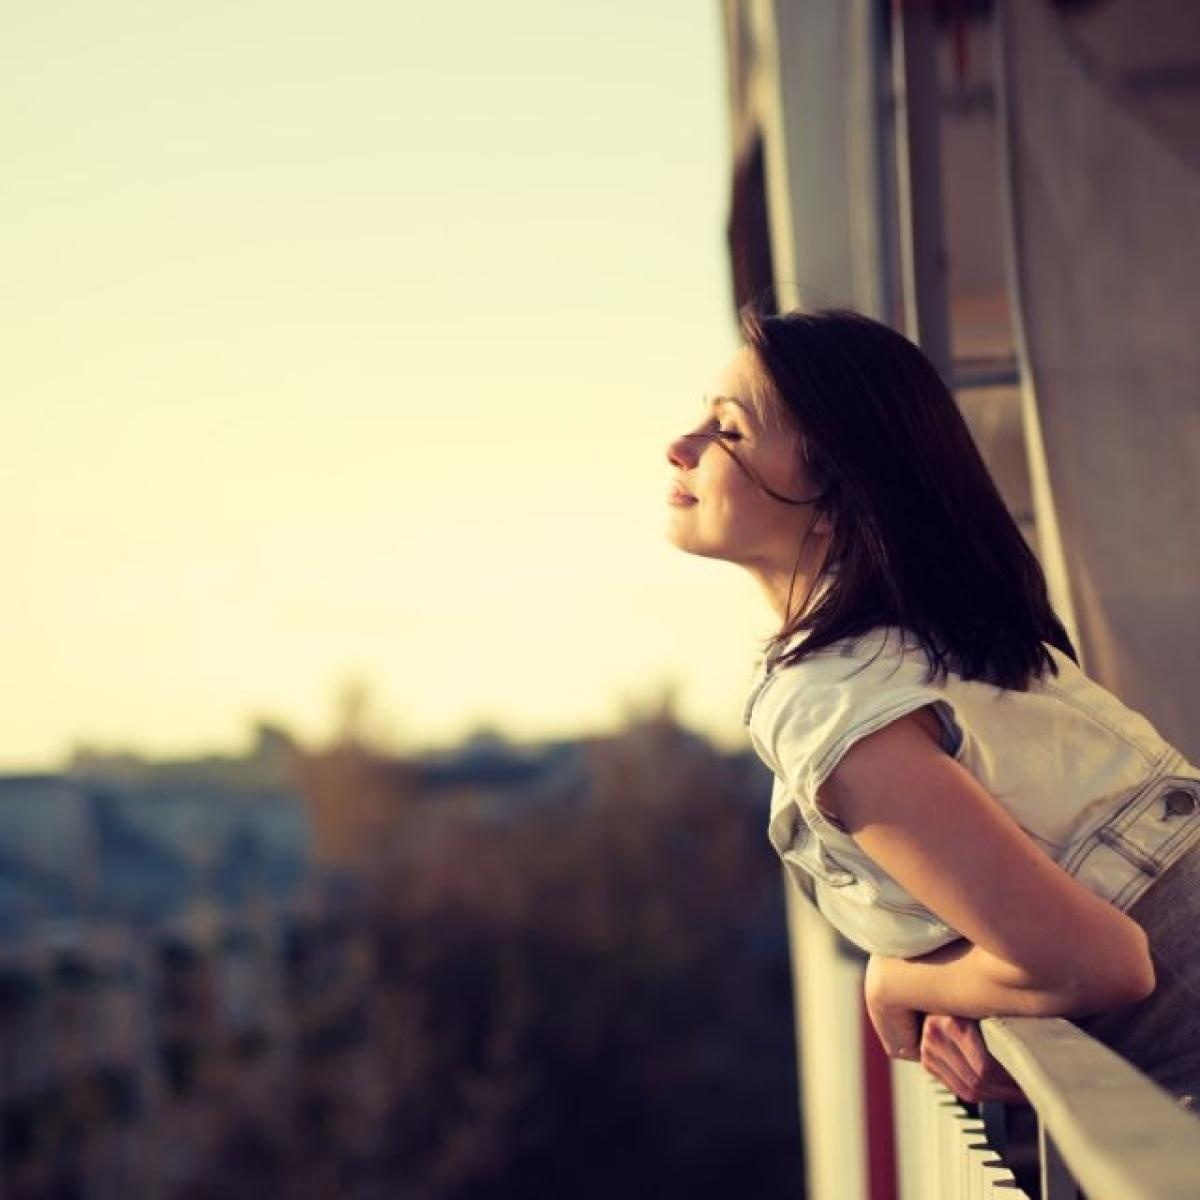 shutterstock sunshine, woman on balcony